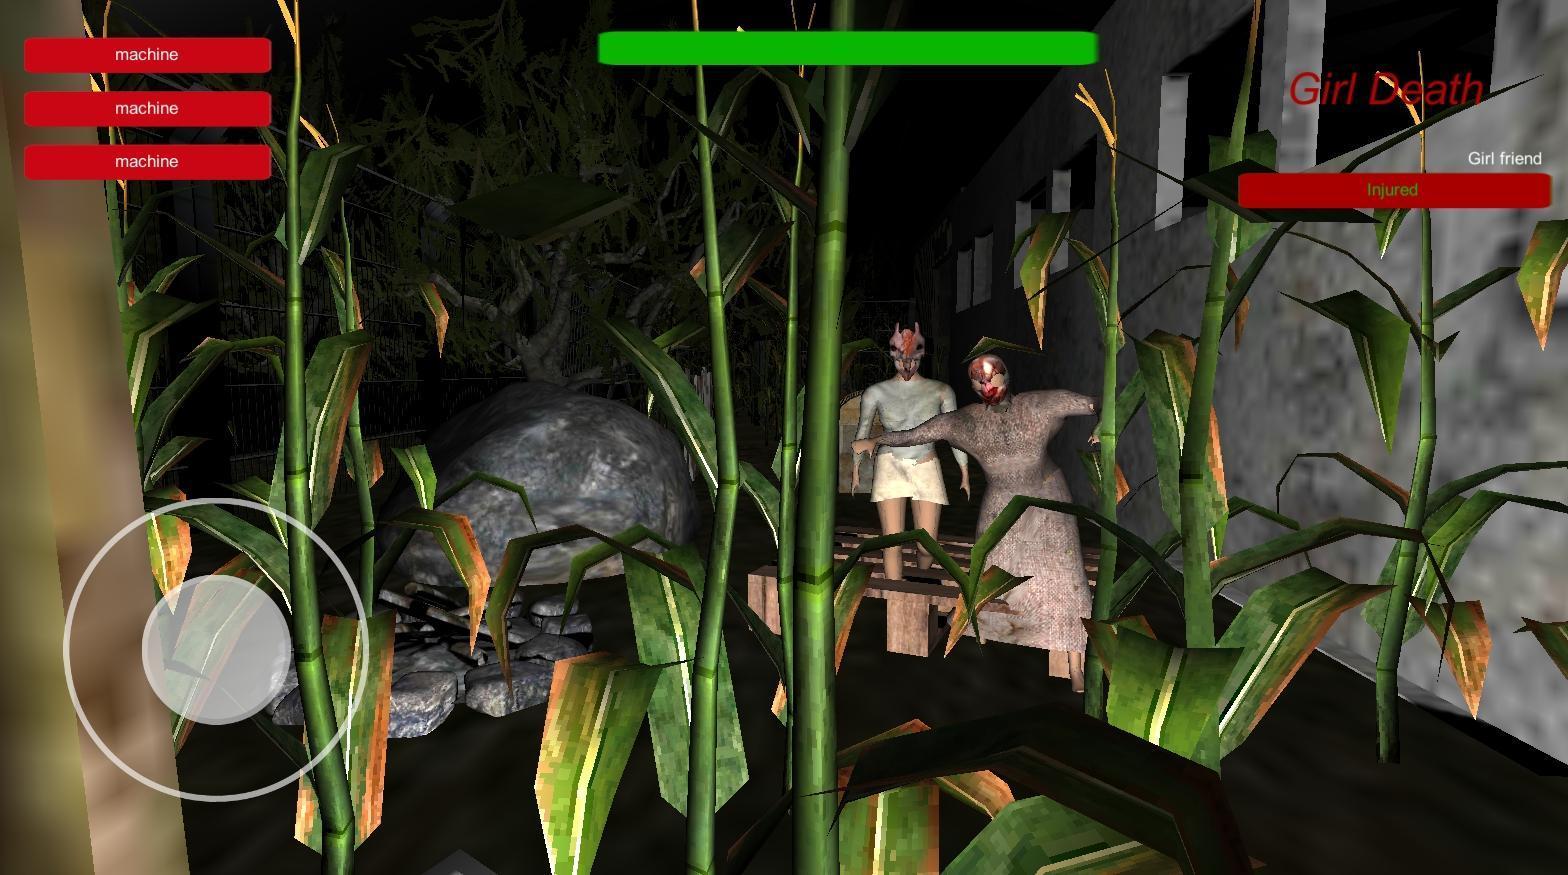 Family Creepy Scary Evil Scream Horror Game 1.6 Screenshot 7